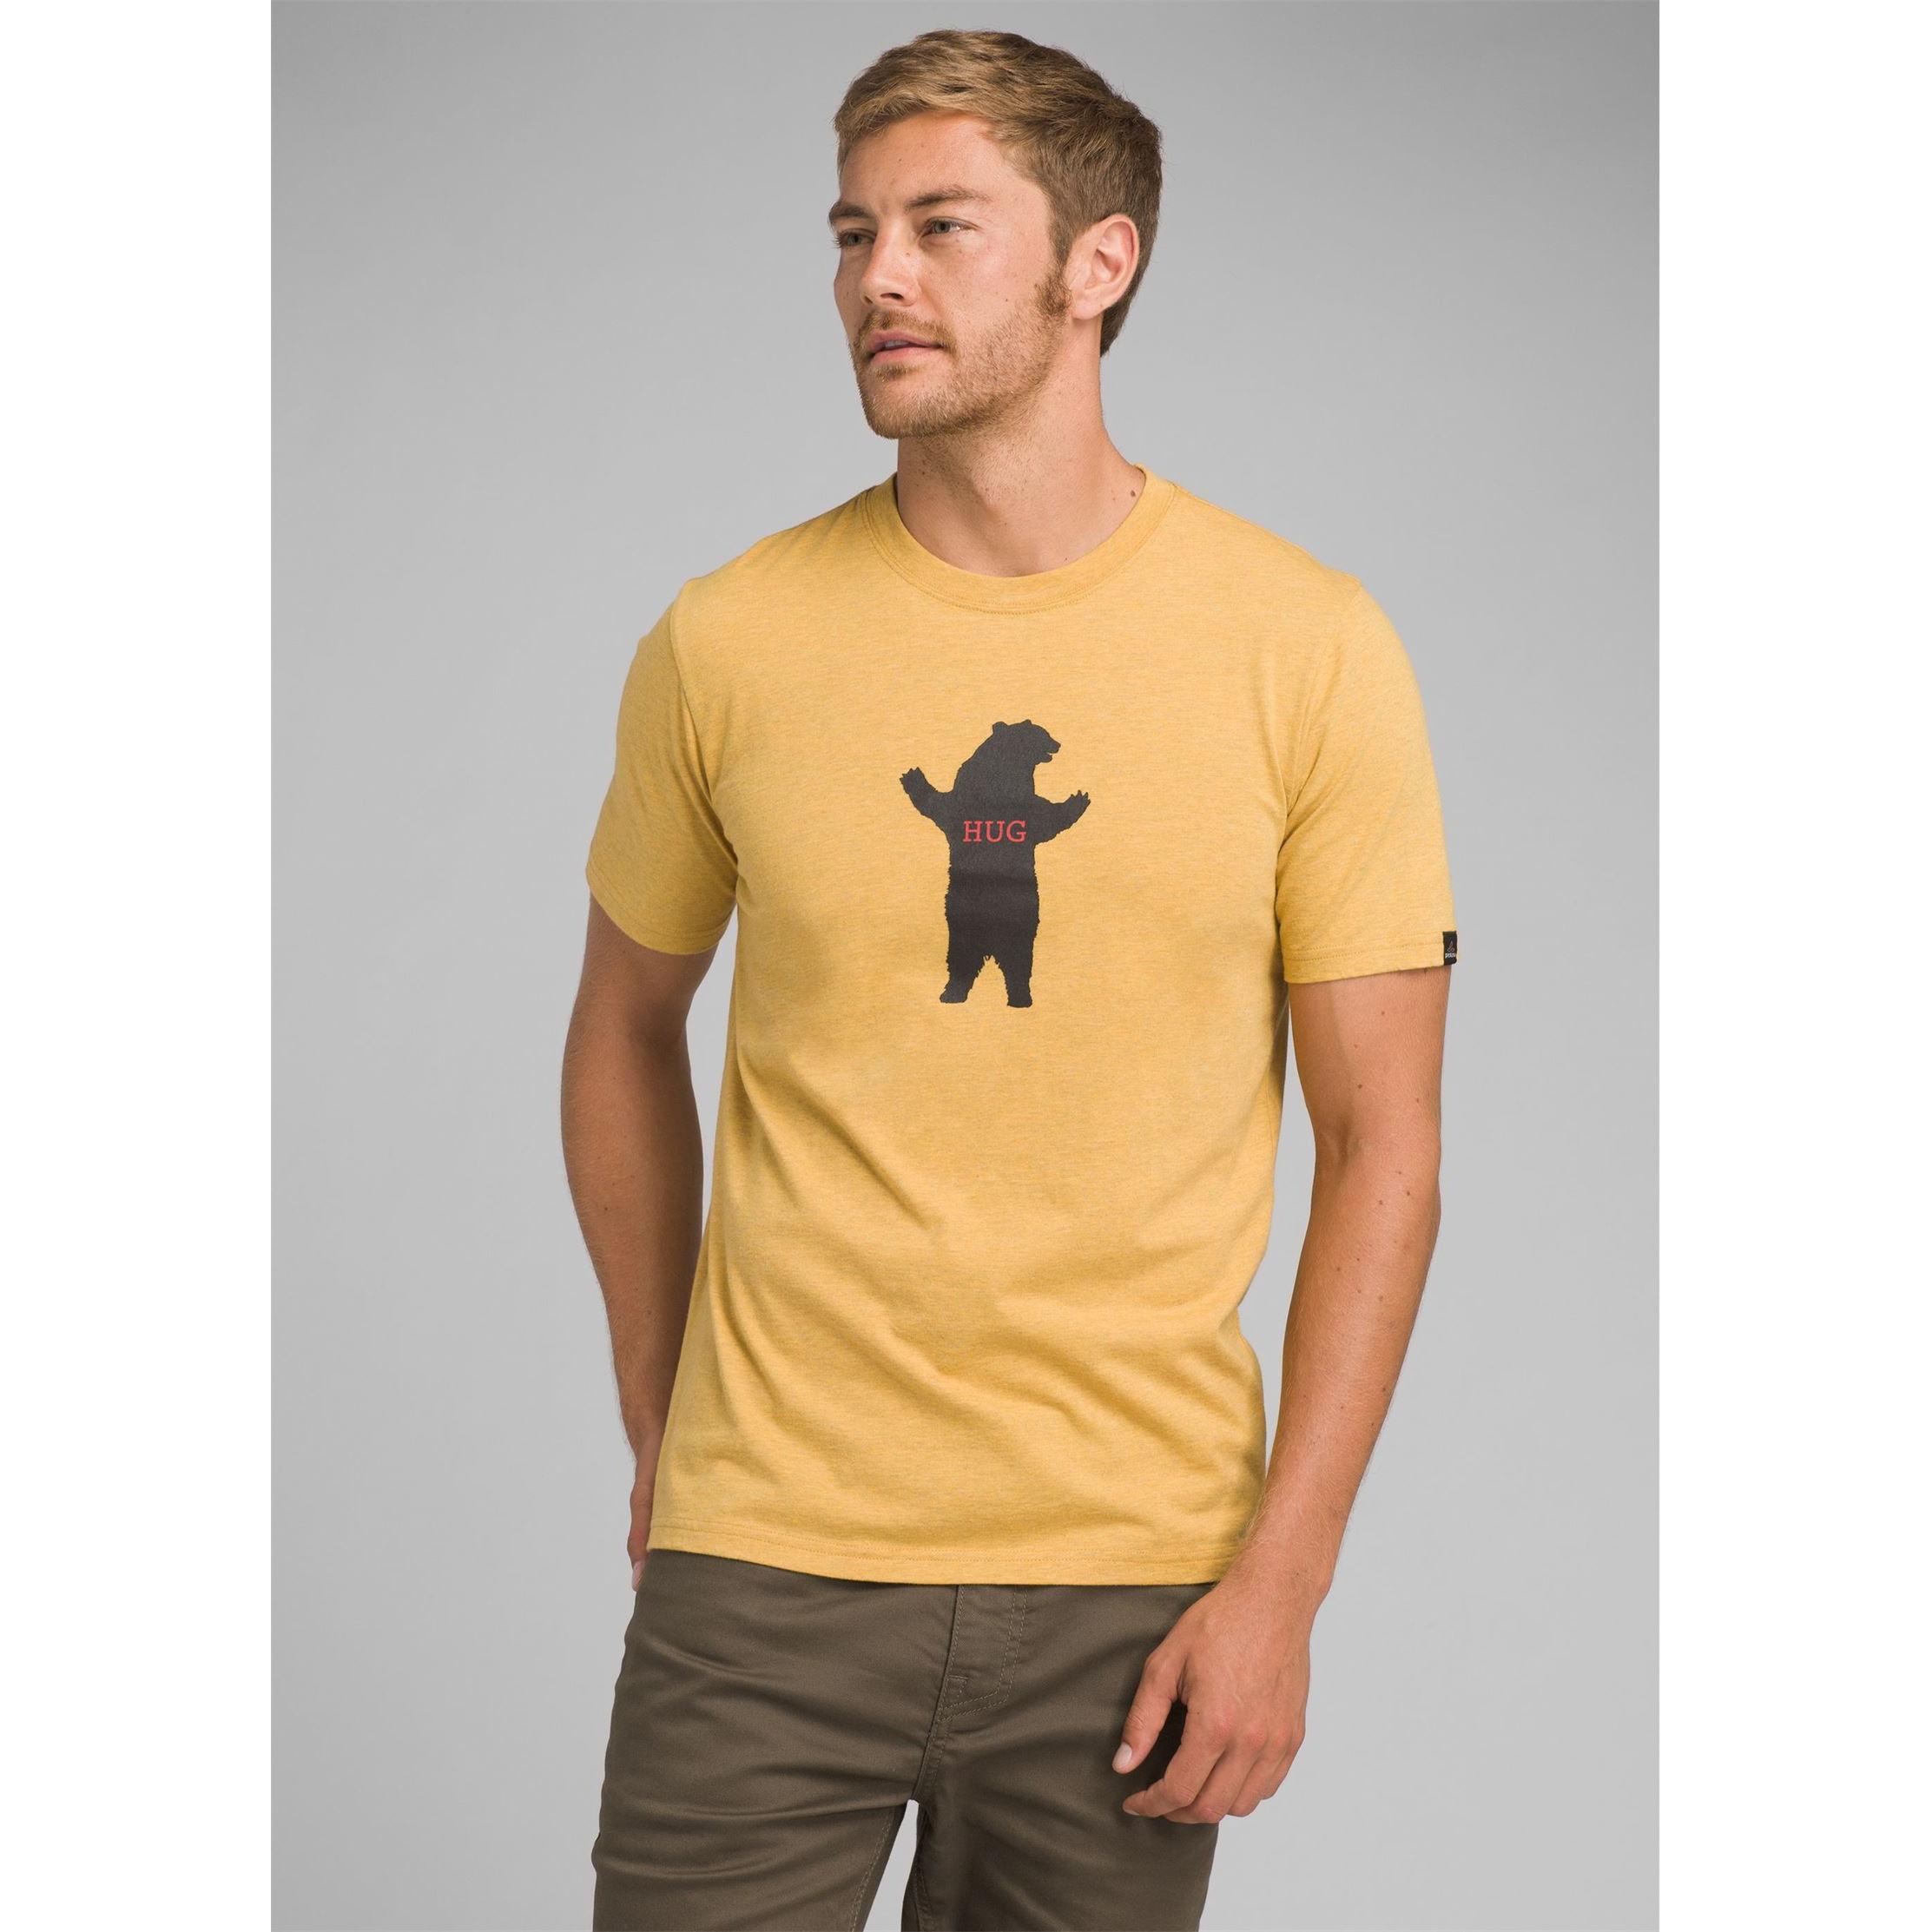 Bear Hug T Shirt Short Sleeve - Men's